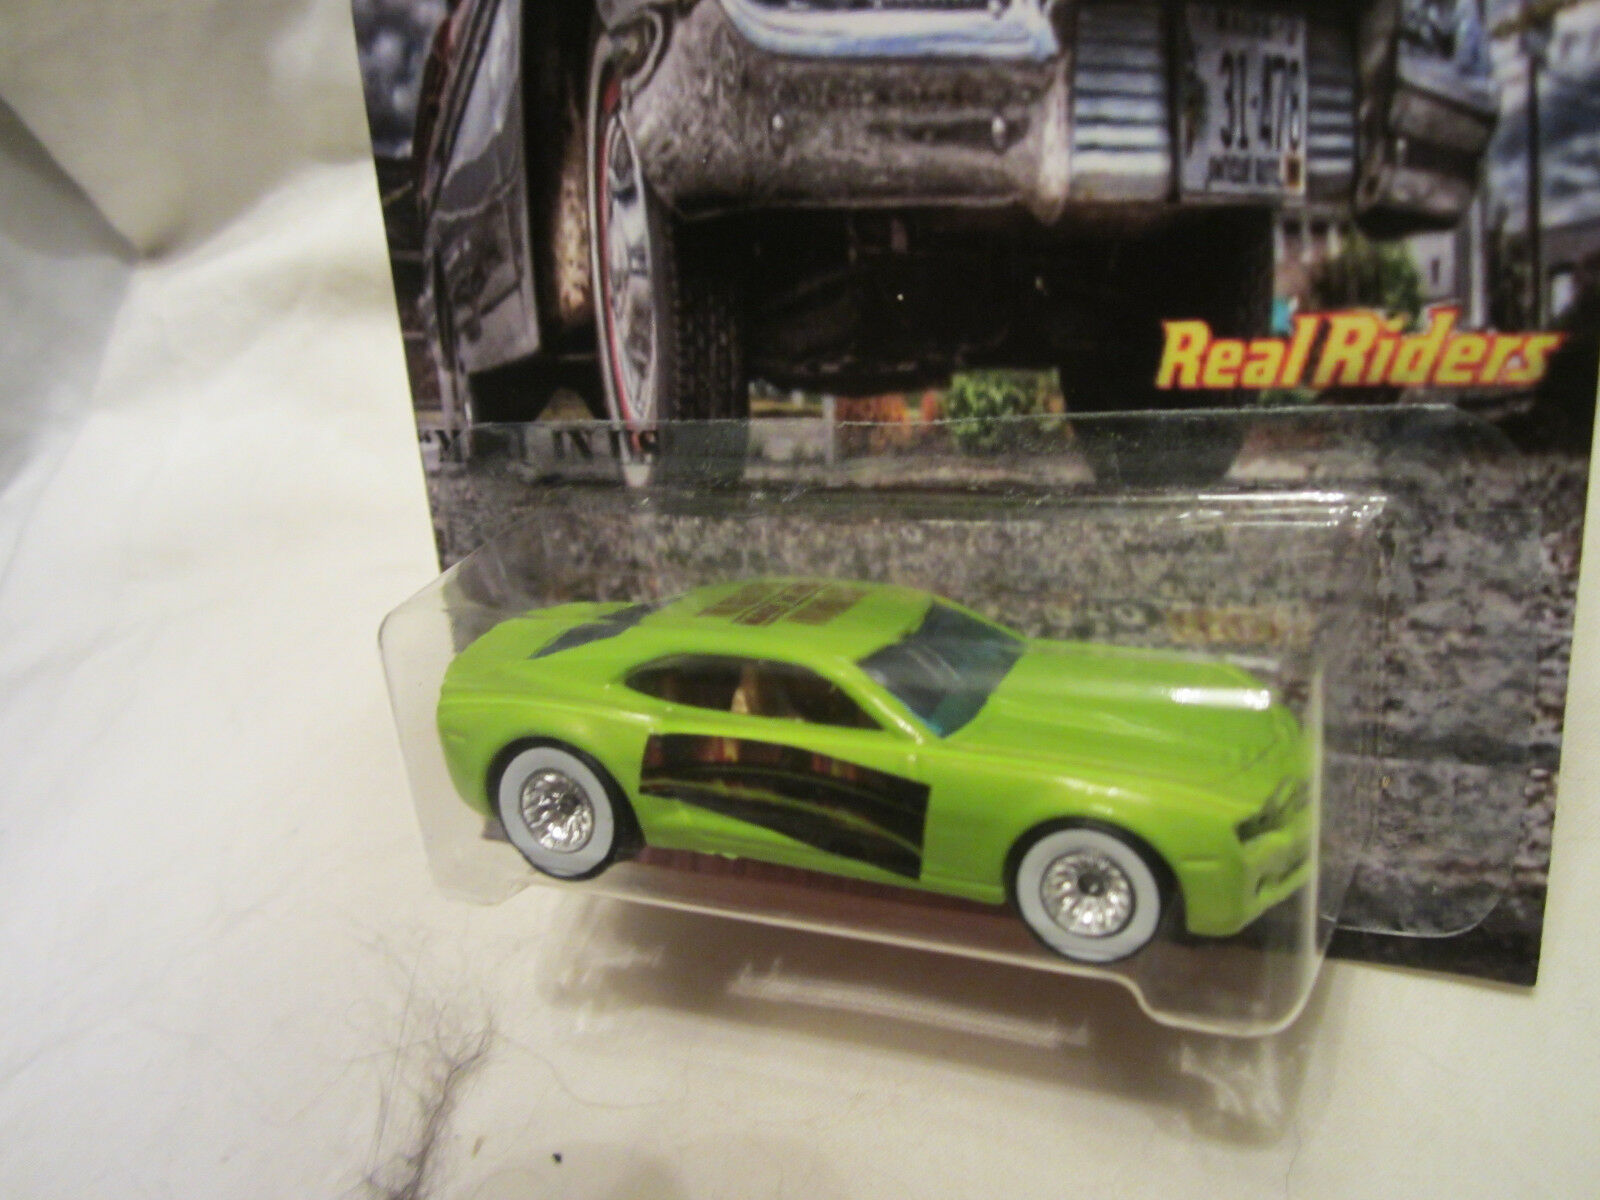 Hot Wheels Wheels Wheels a Medida Chevy Camaro  Hecho en USA  Real Riders Ltd 1 25 Made 16445c